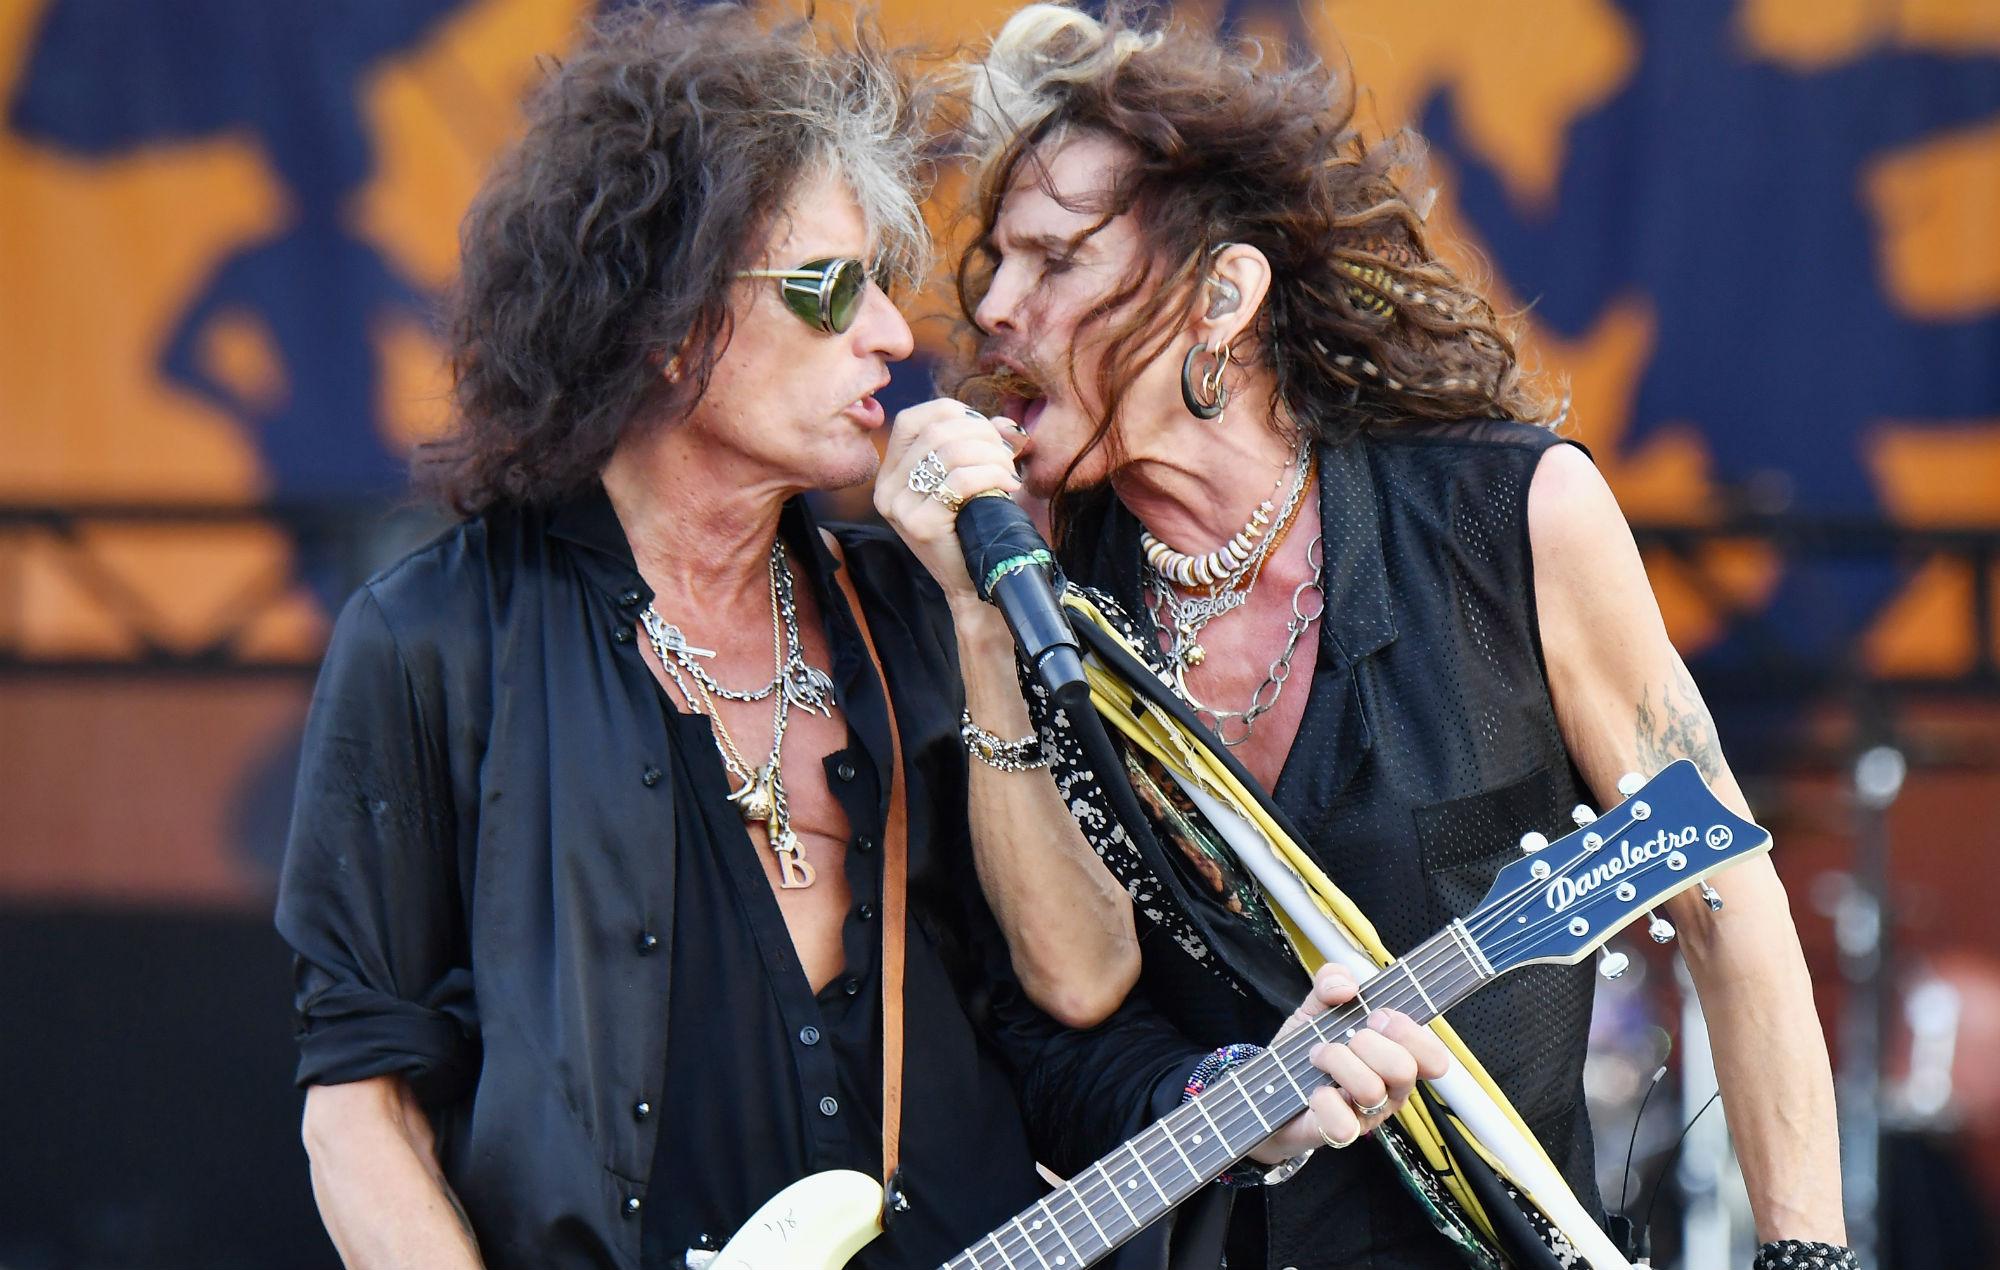 Dan Michaels - Aerosmith is goin' to Vegas